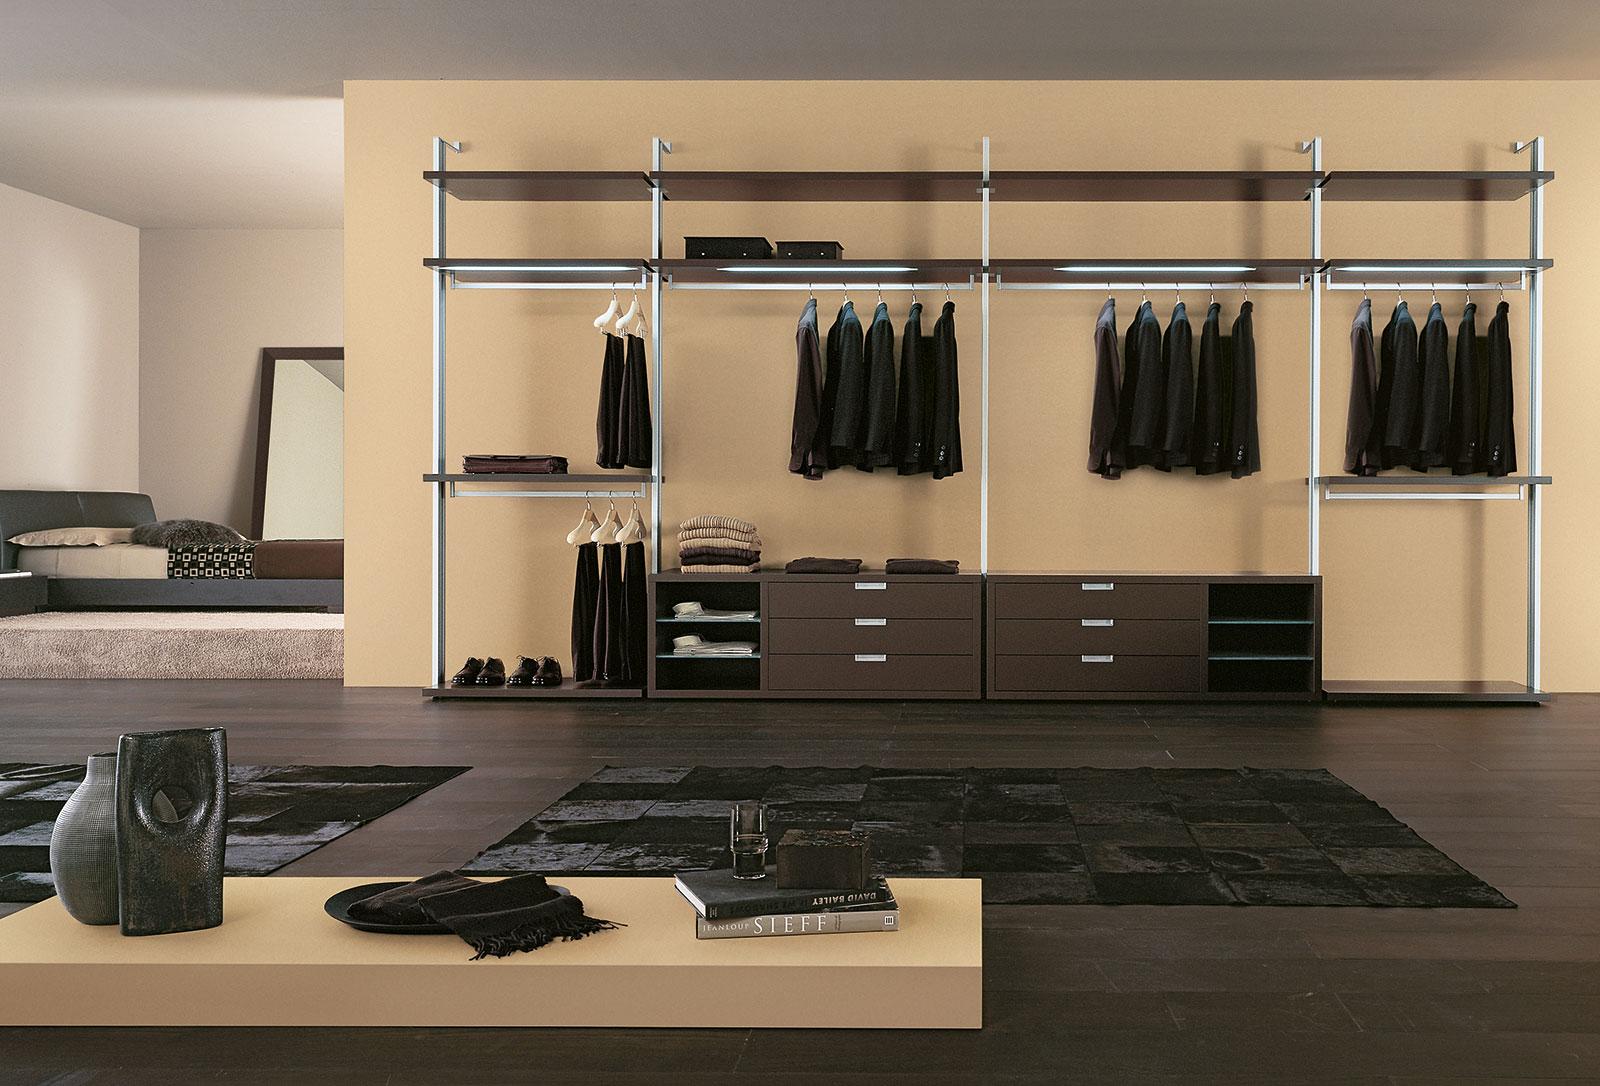 Cabina Armadio Walk In Closets : Cabina armadio su misura porte sistemi henry glass